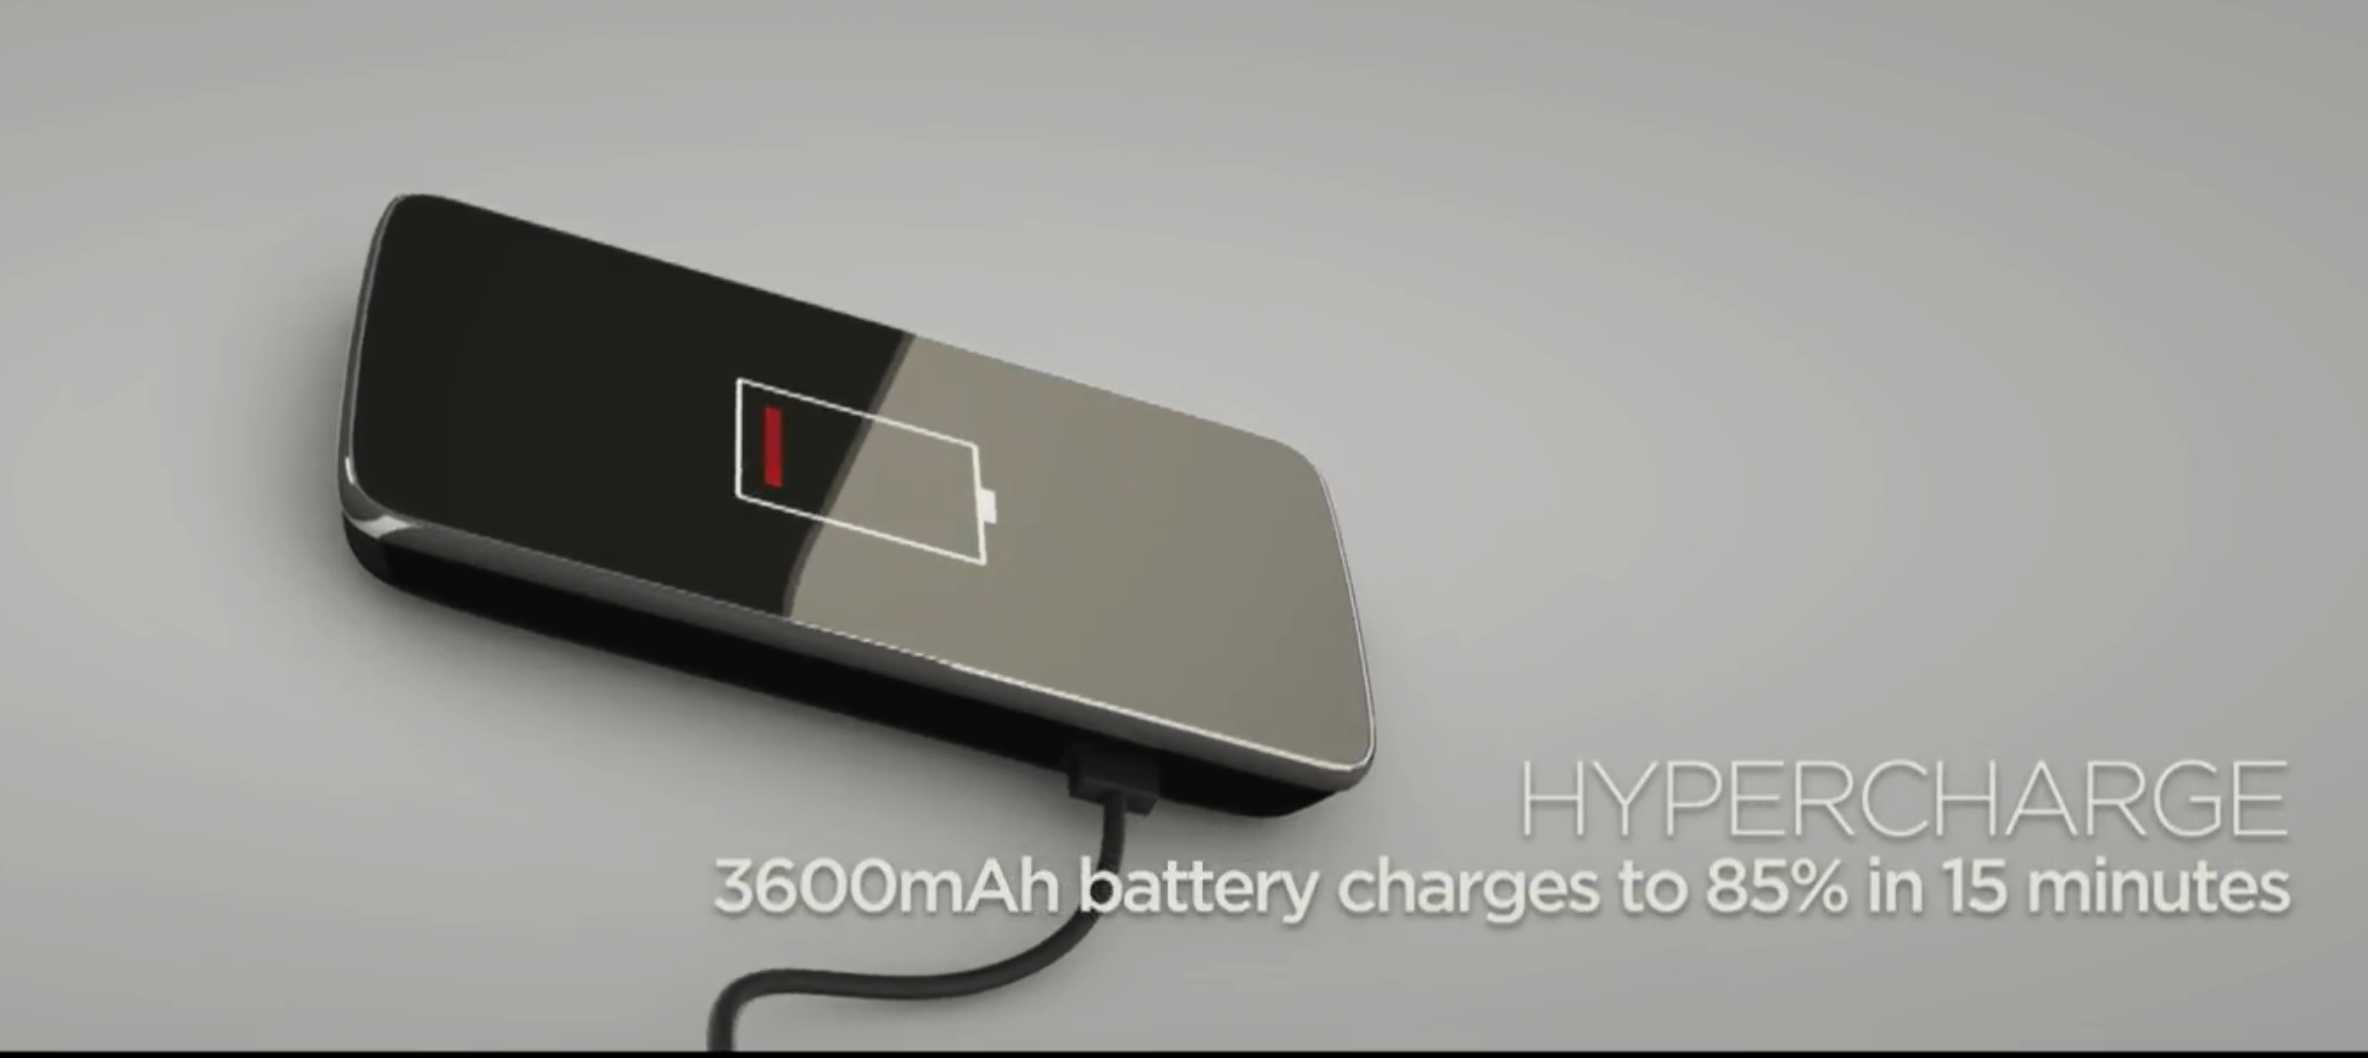 Moto hypercharge mod